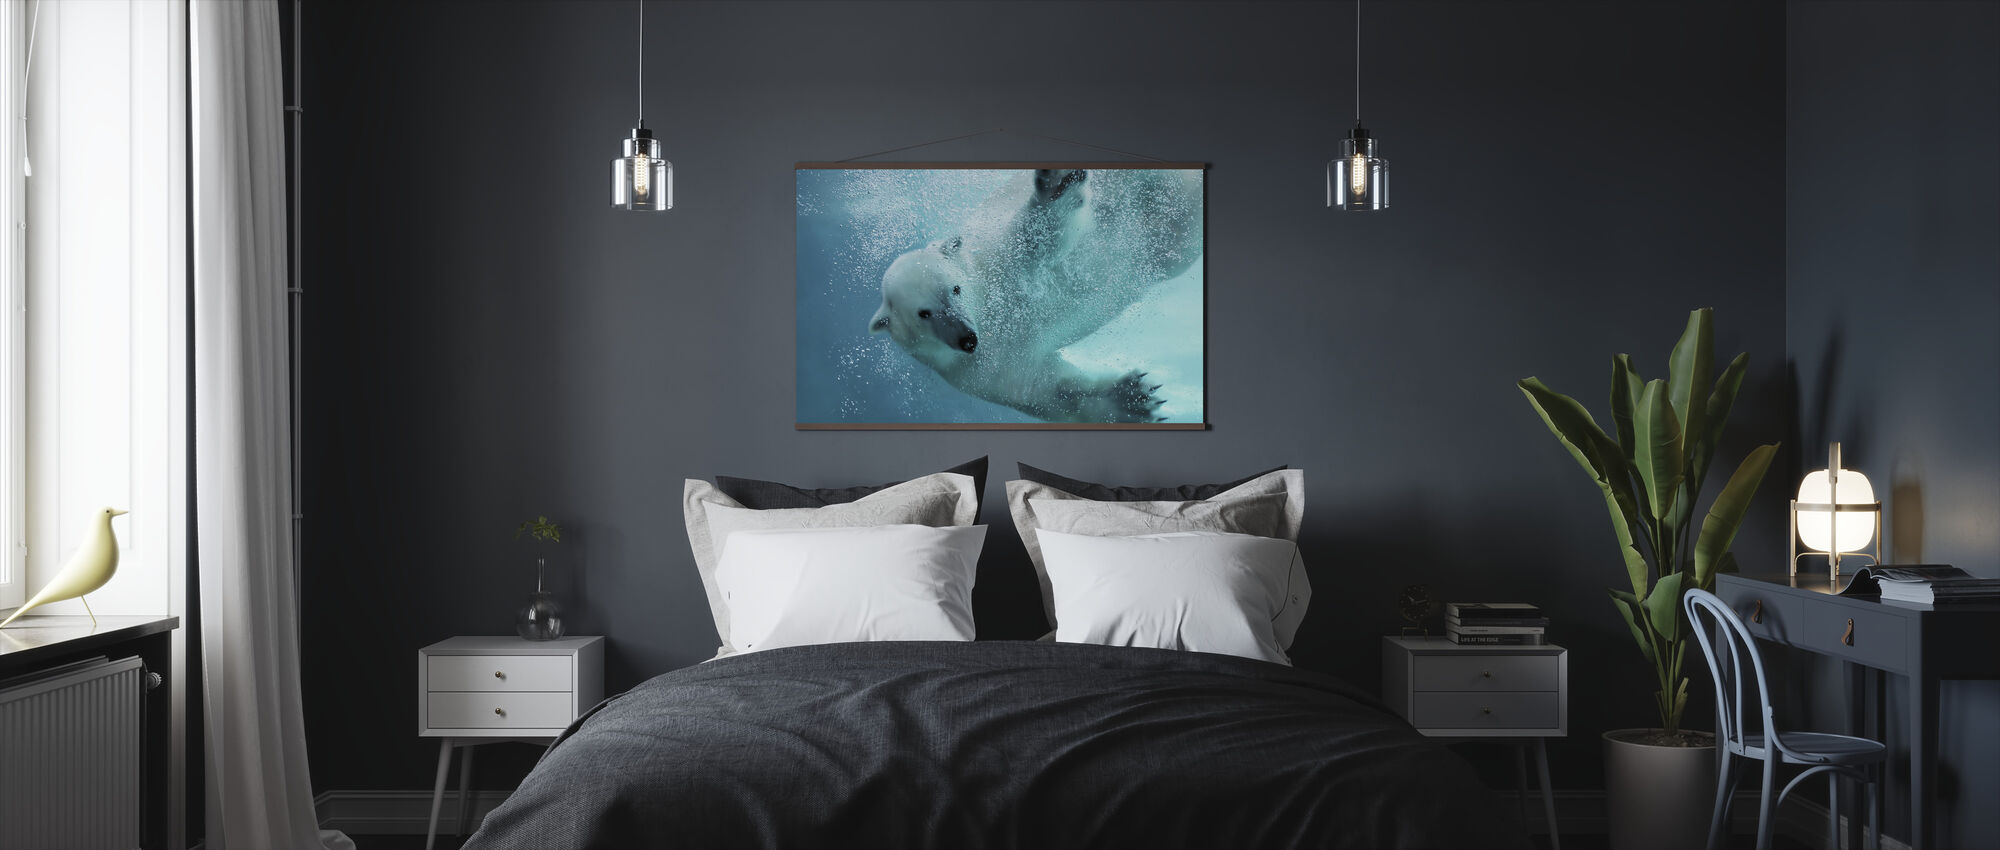 Underwater Polar Bear - Poster - Bedroom